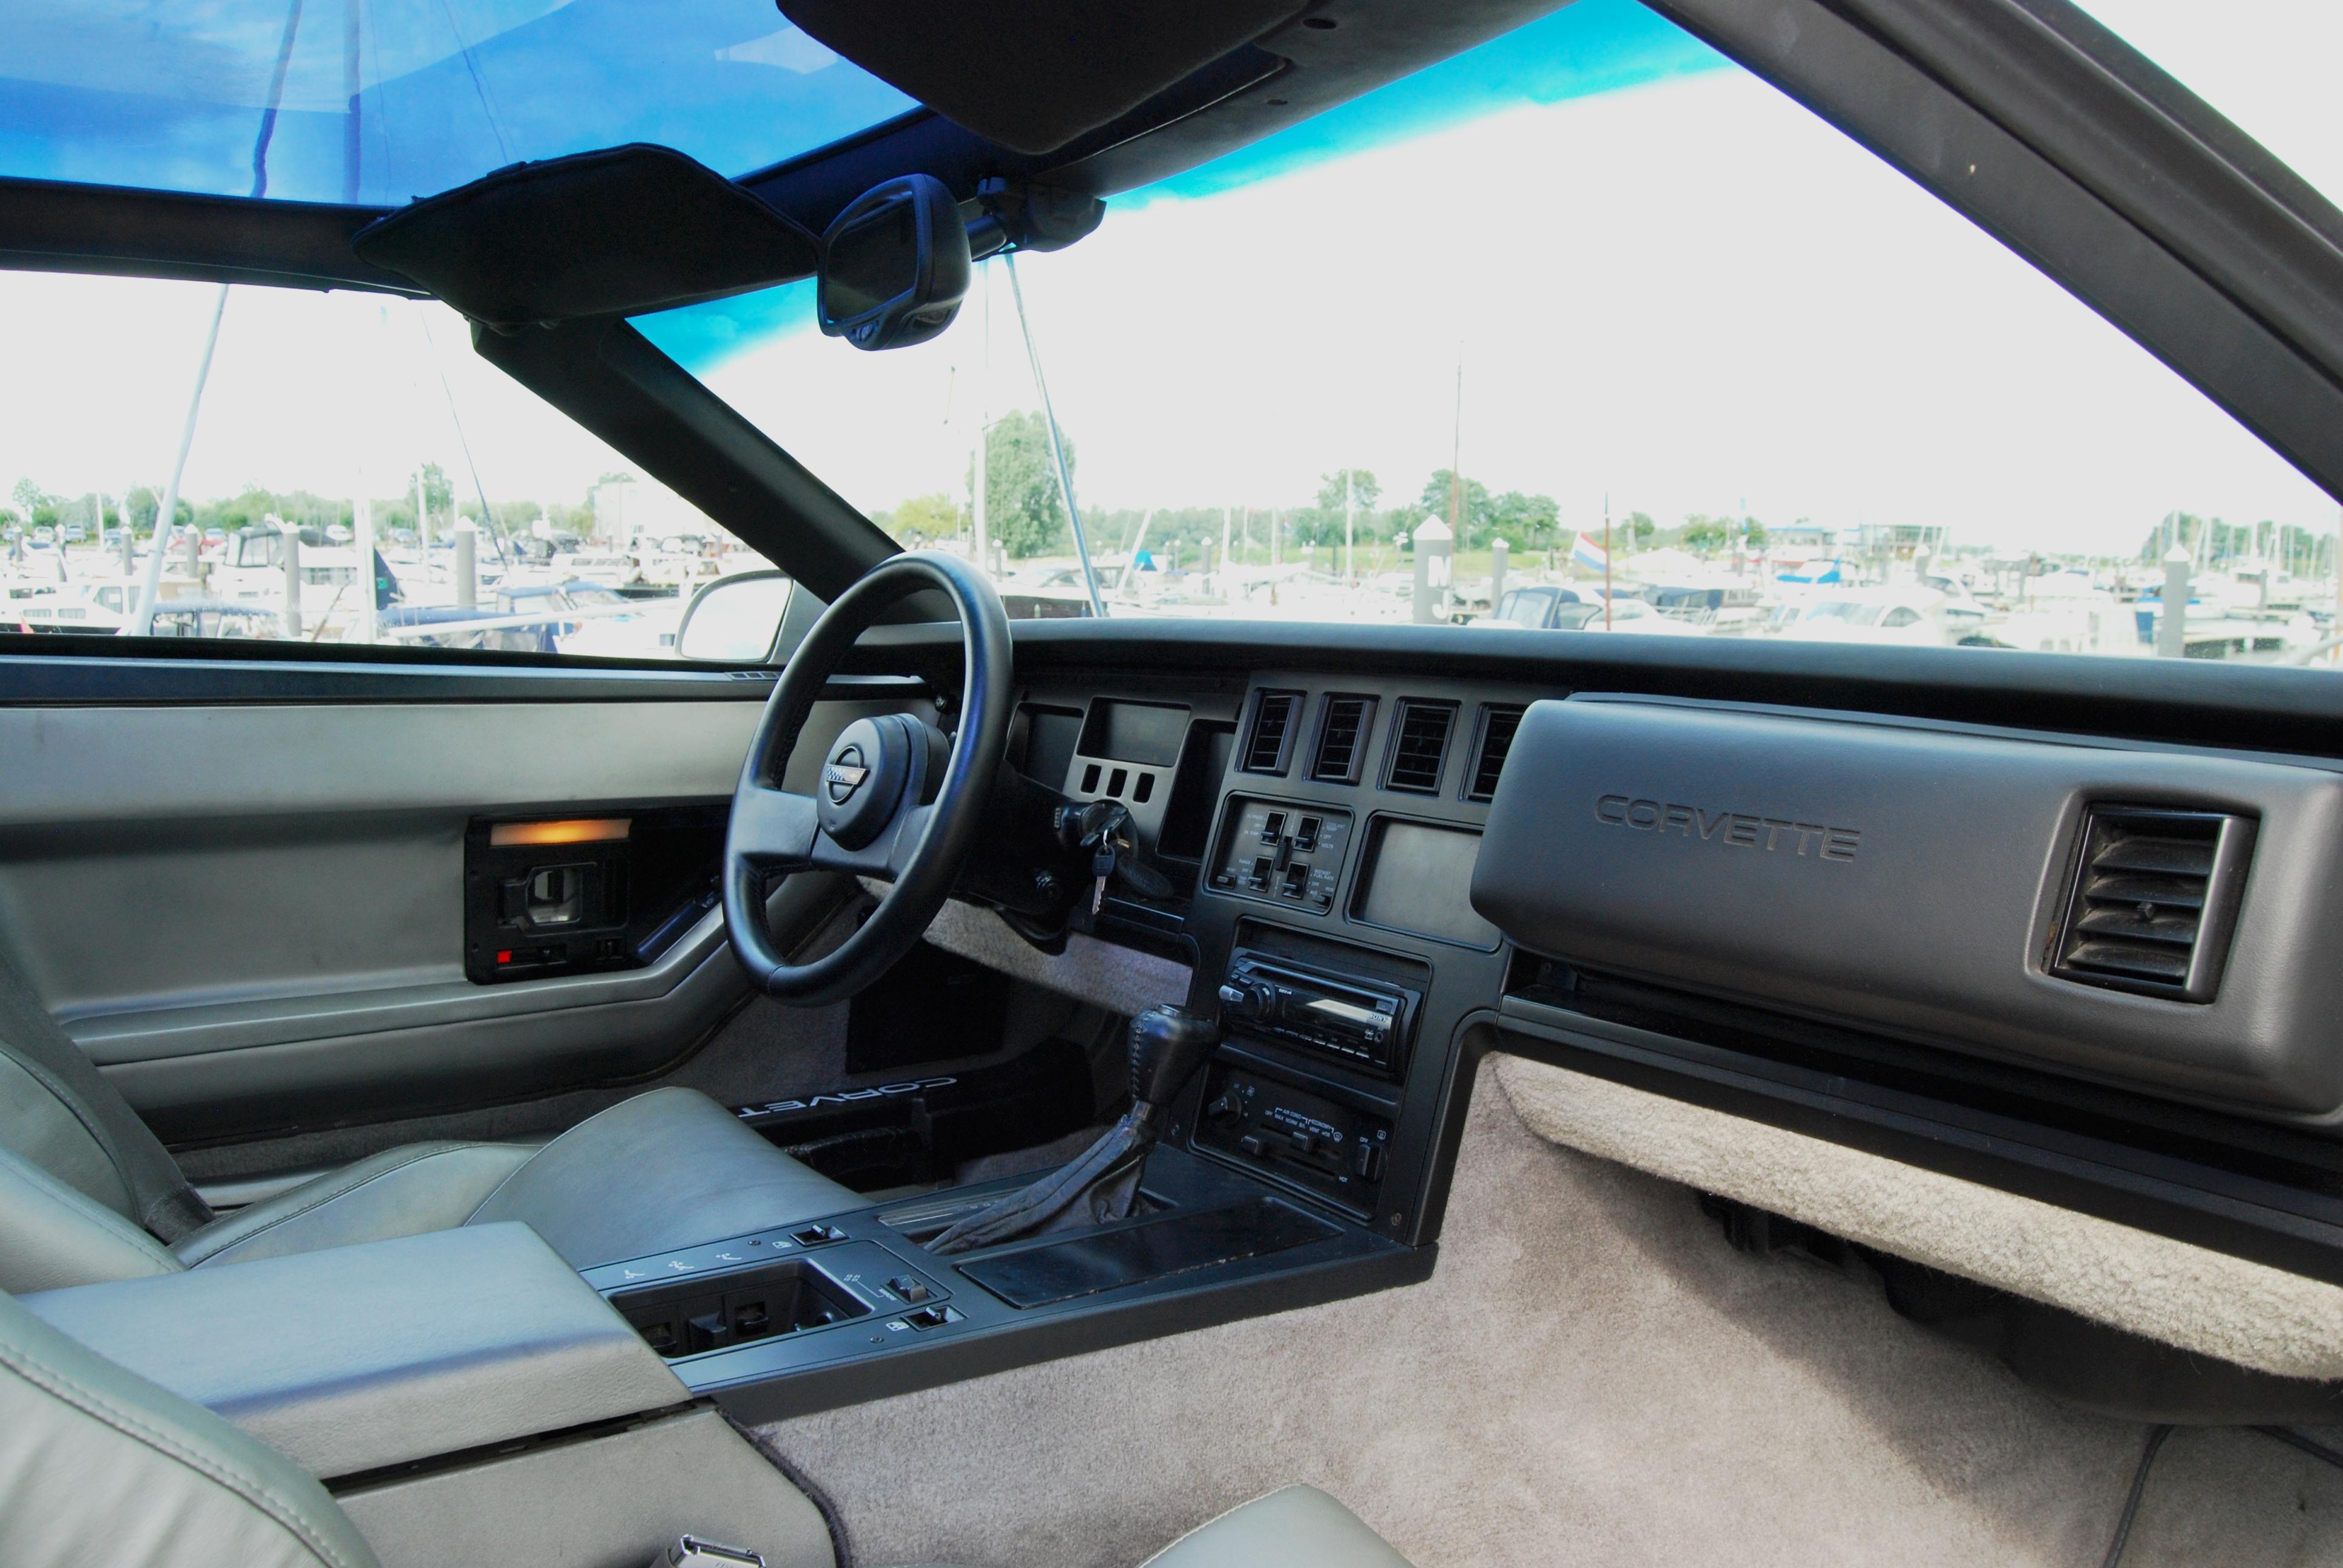 File:1986 Corvette C4 interior jpg - Wikimedia Commons